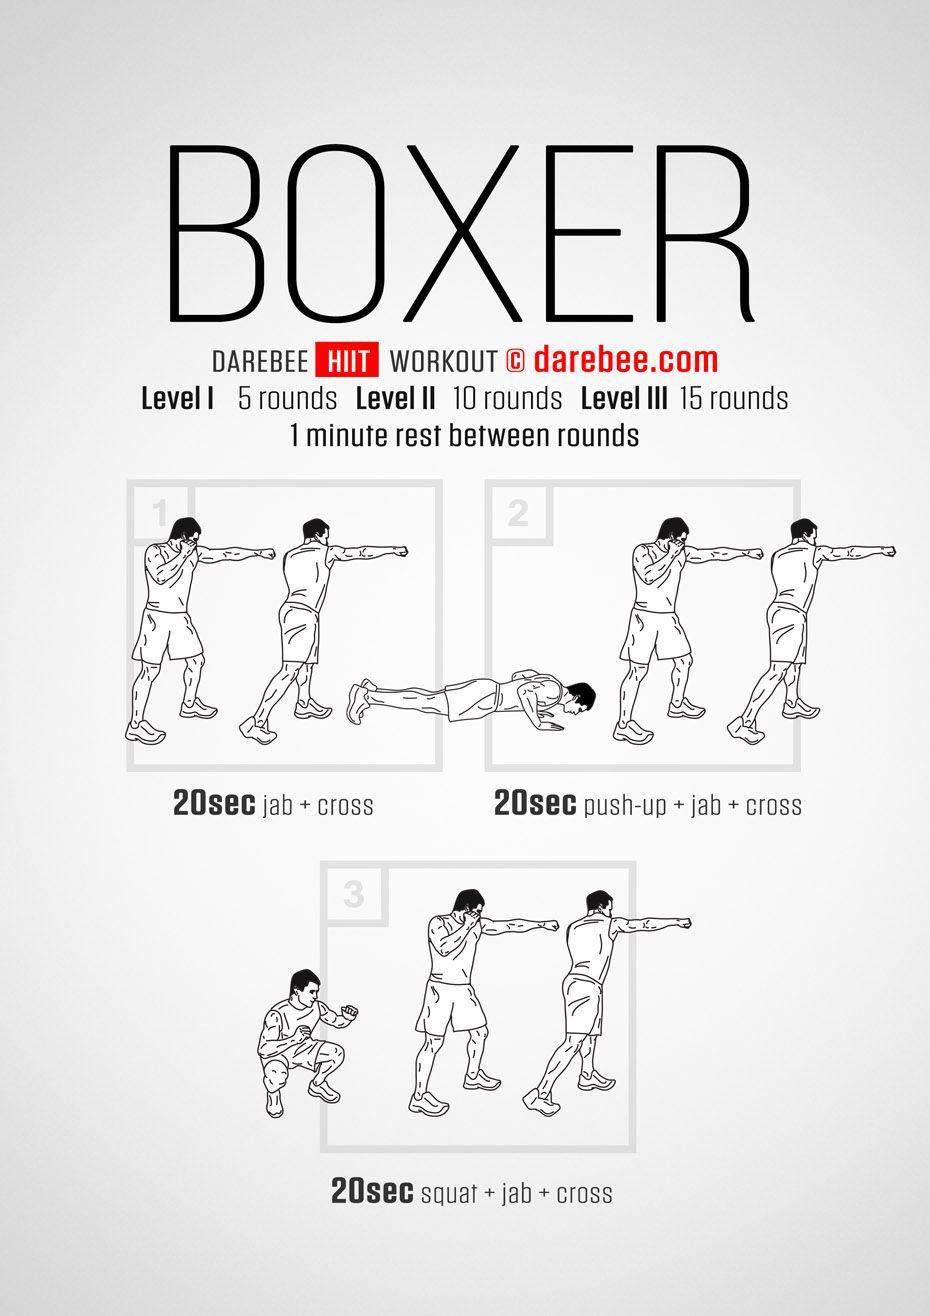 Boxer HIIT Workout-Boxers have phenomenal limb speed, arm